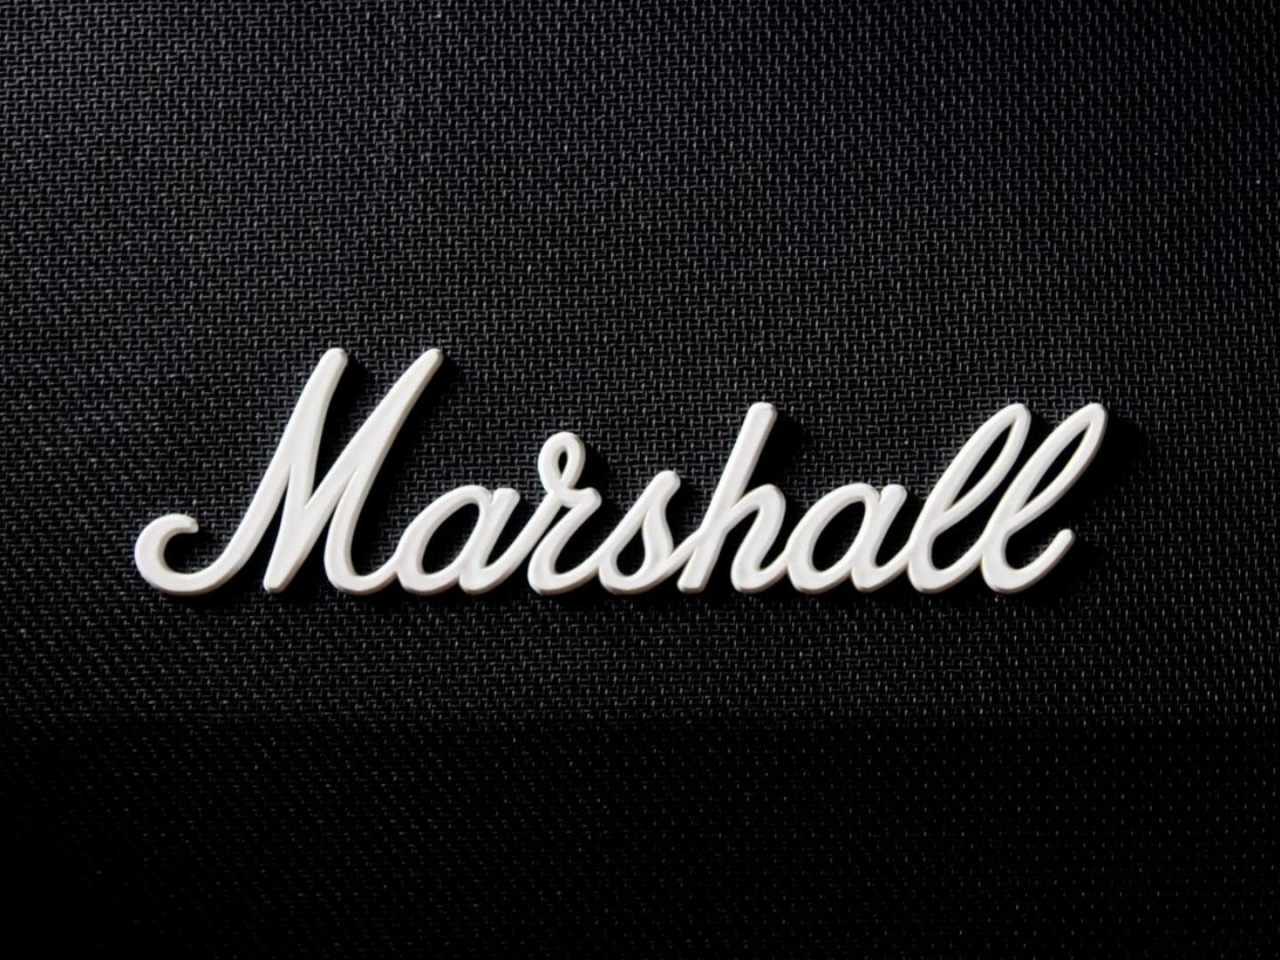 Marshall - 1280x960